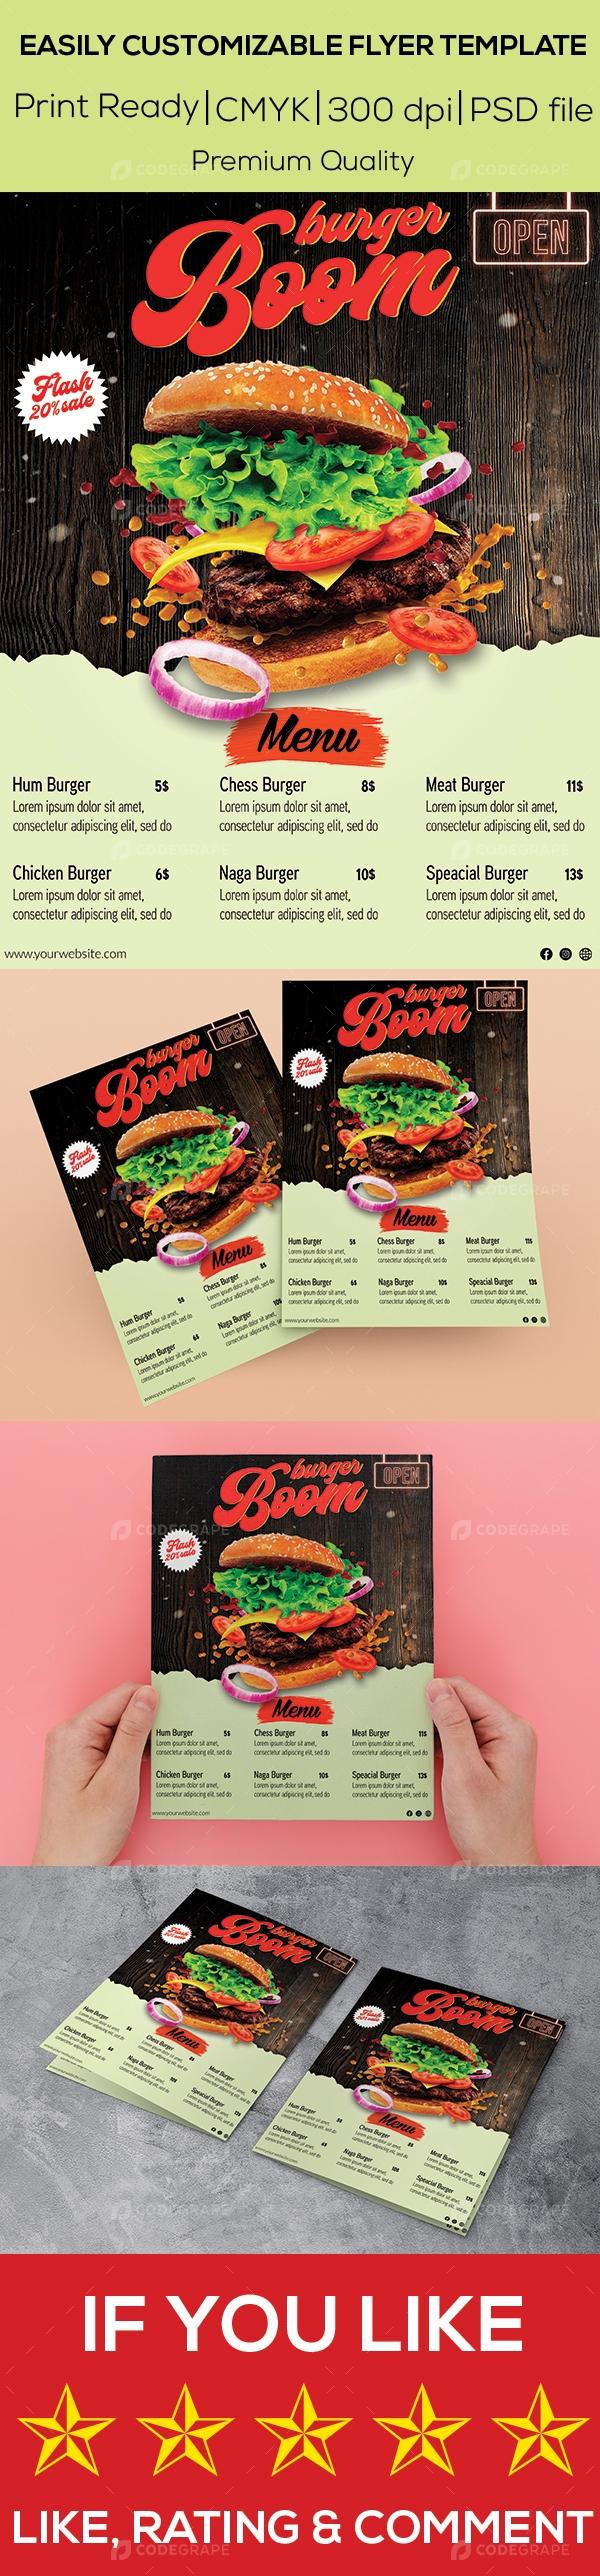 Restaurant Flyer Design